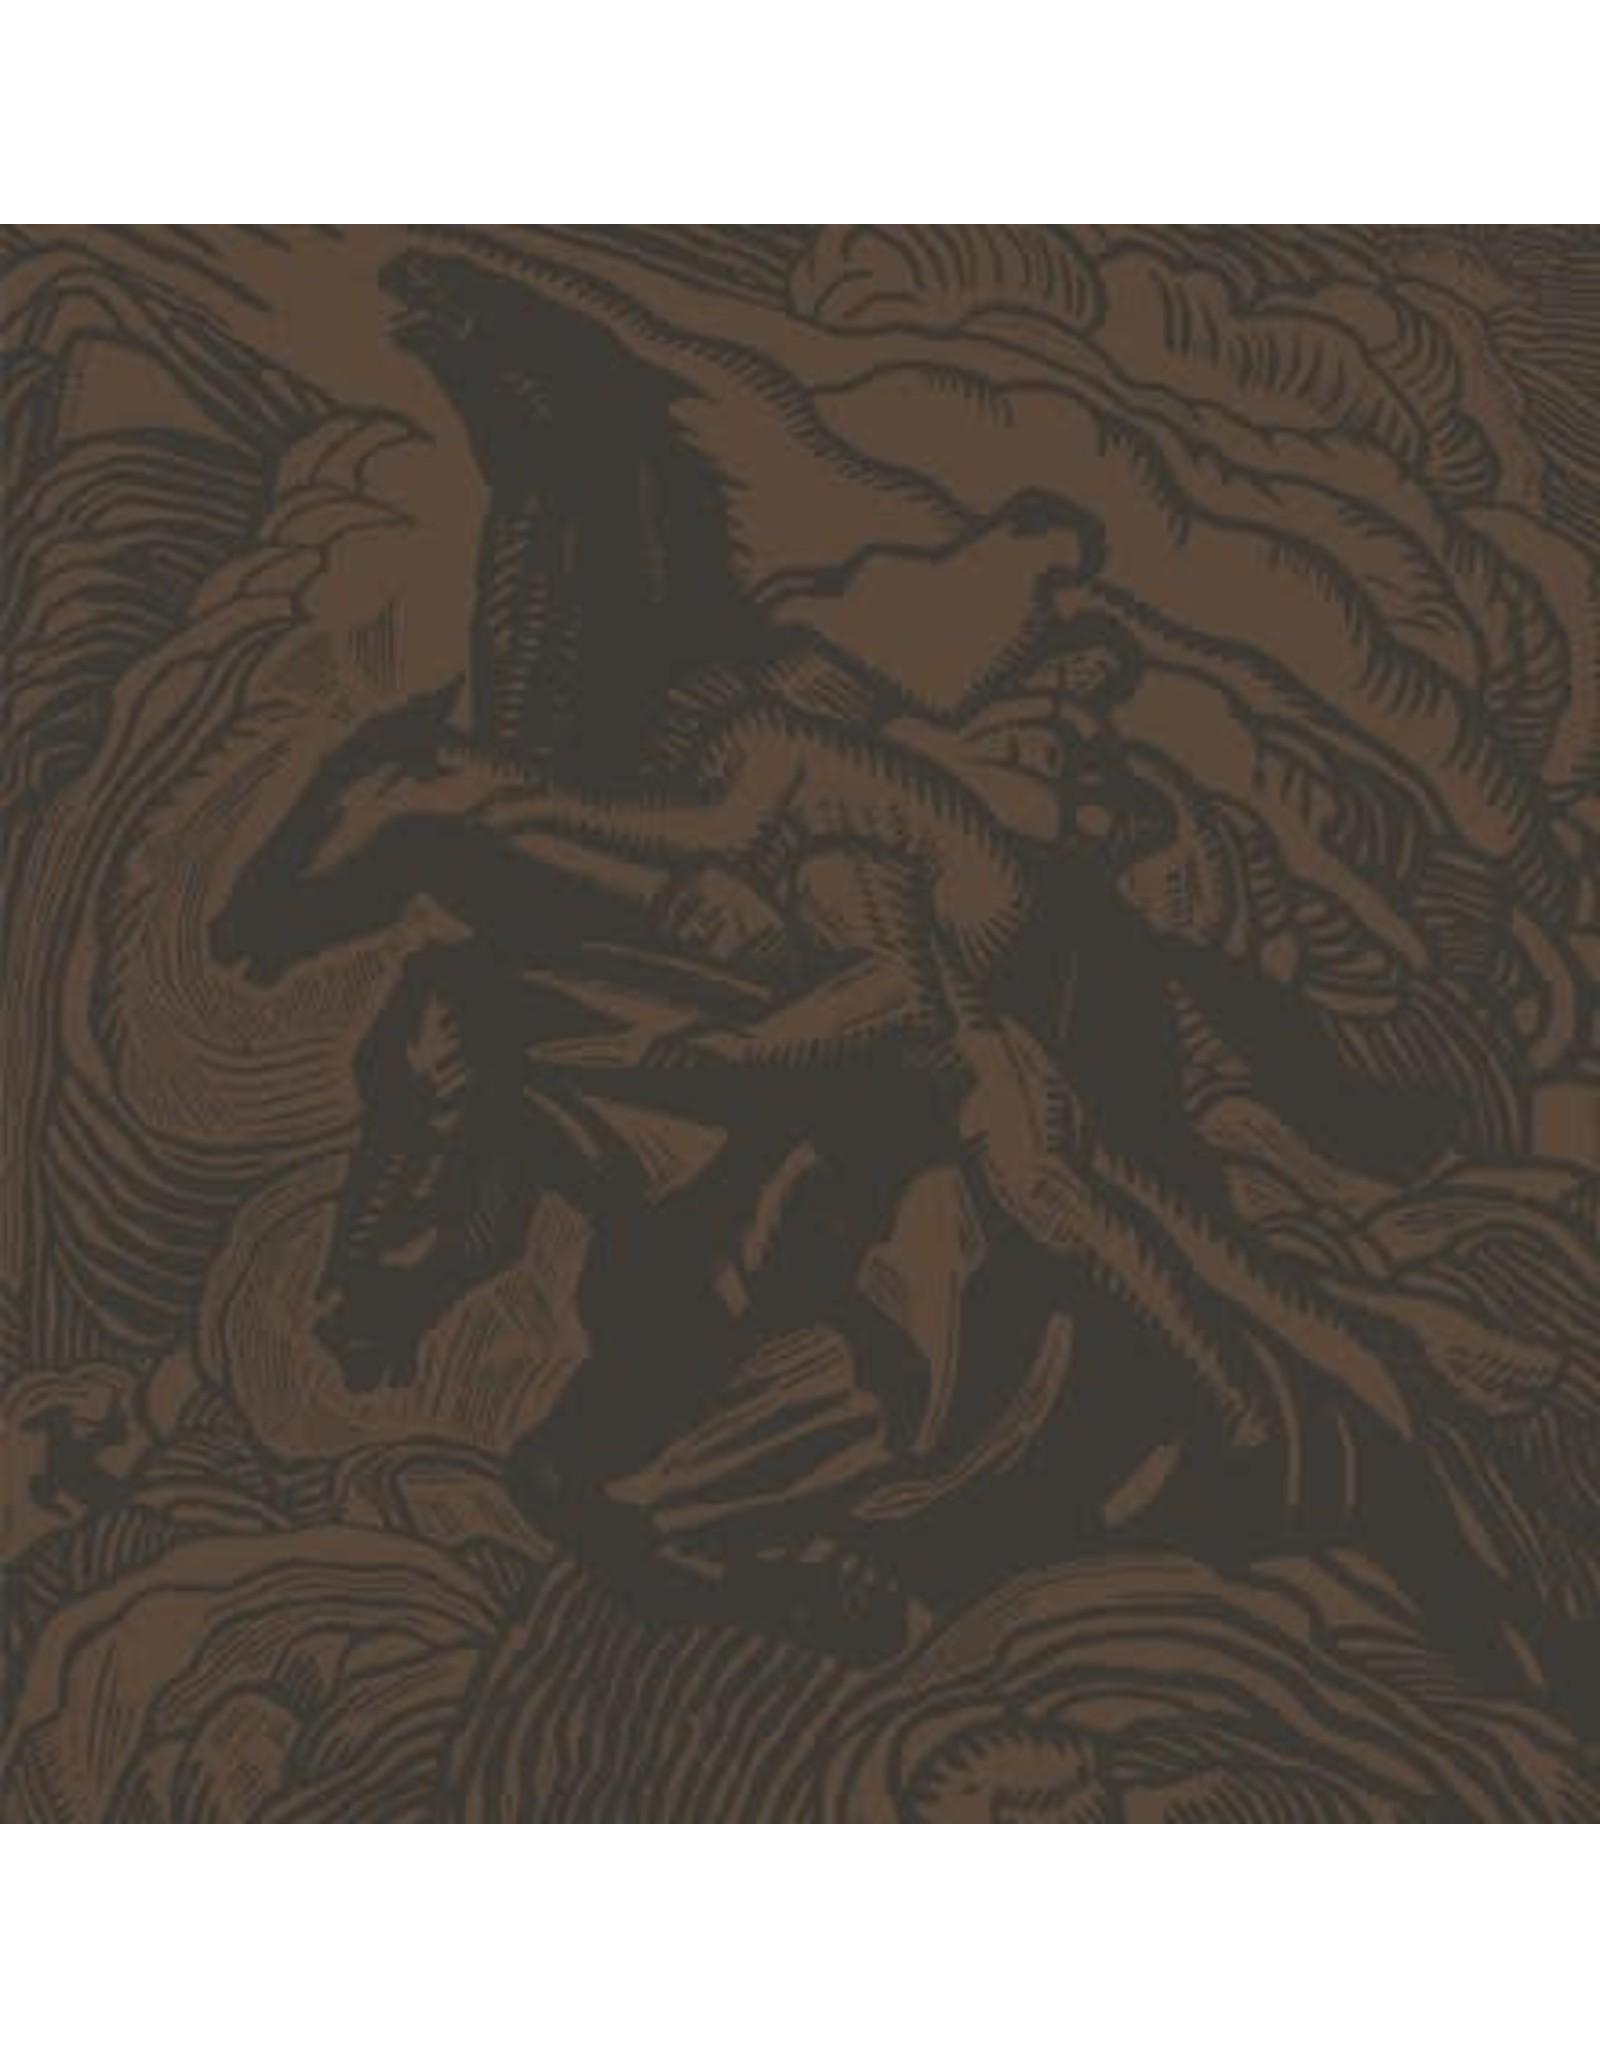 Southern Lord Sunn O))): Flight Of the Behemoth LP